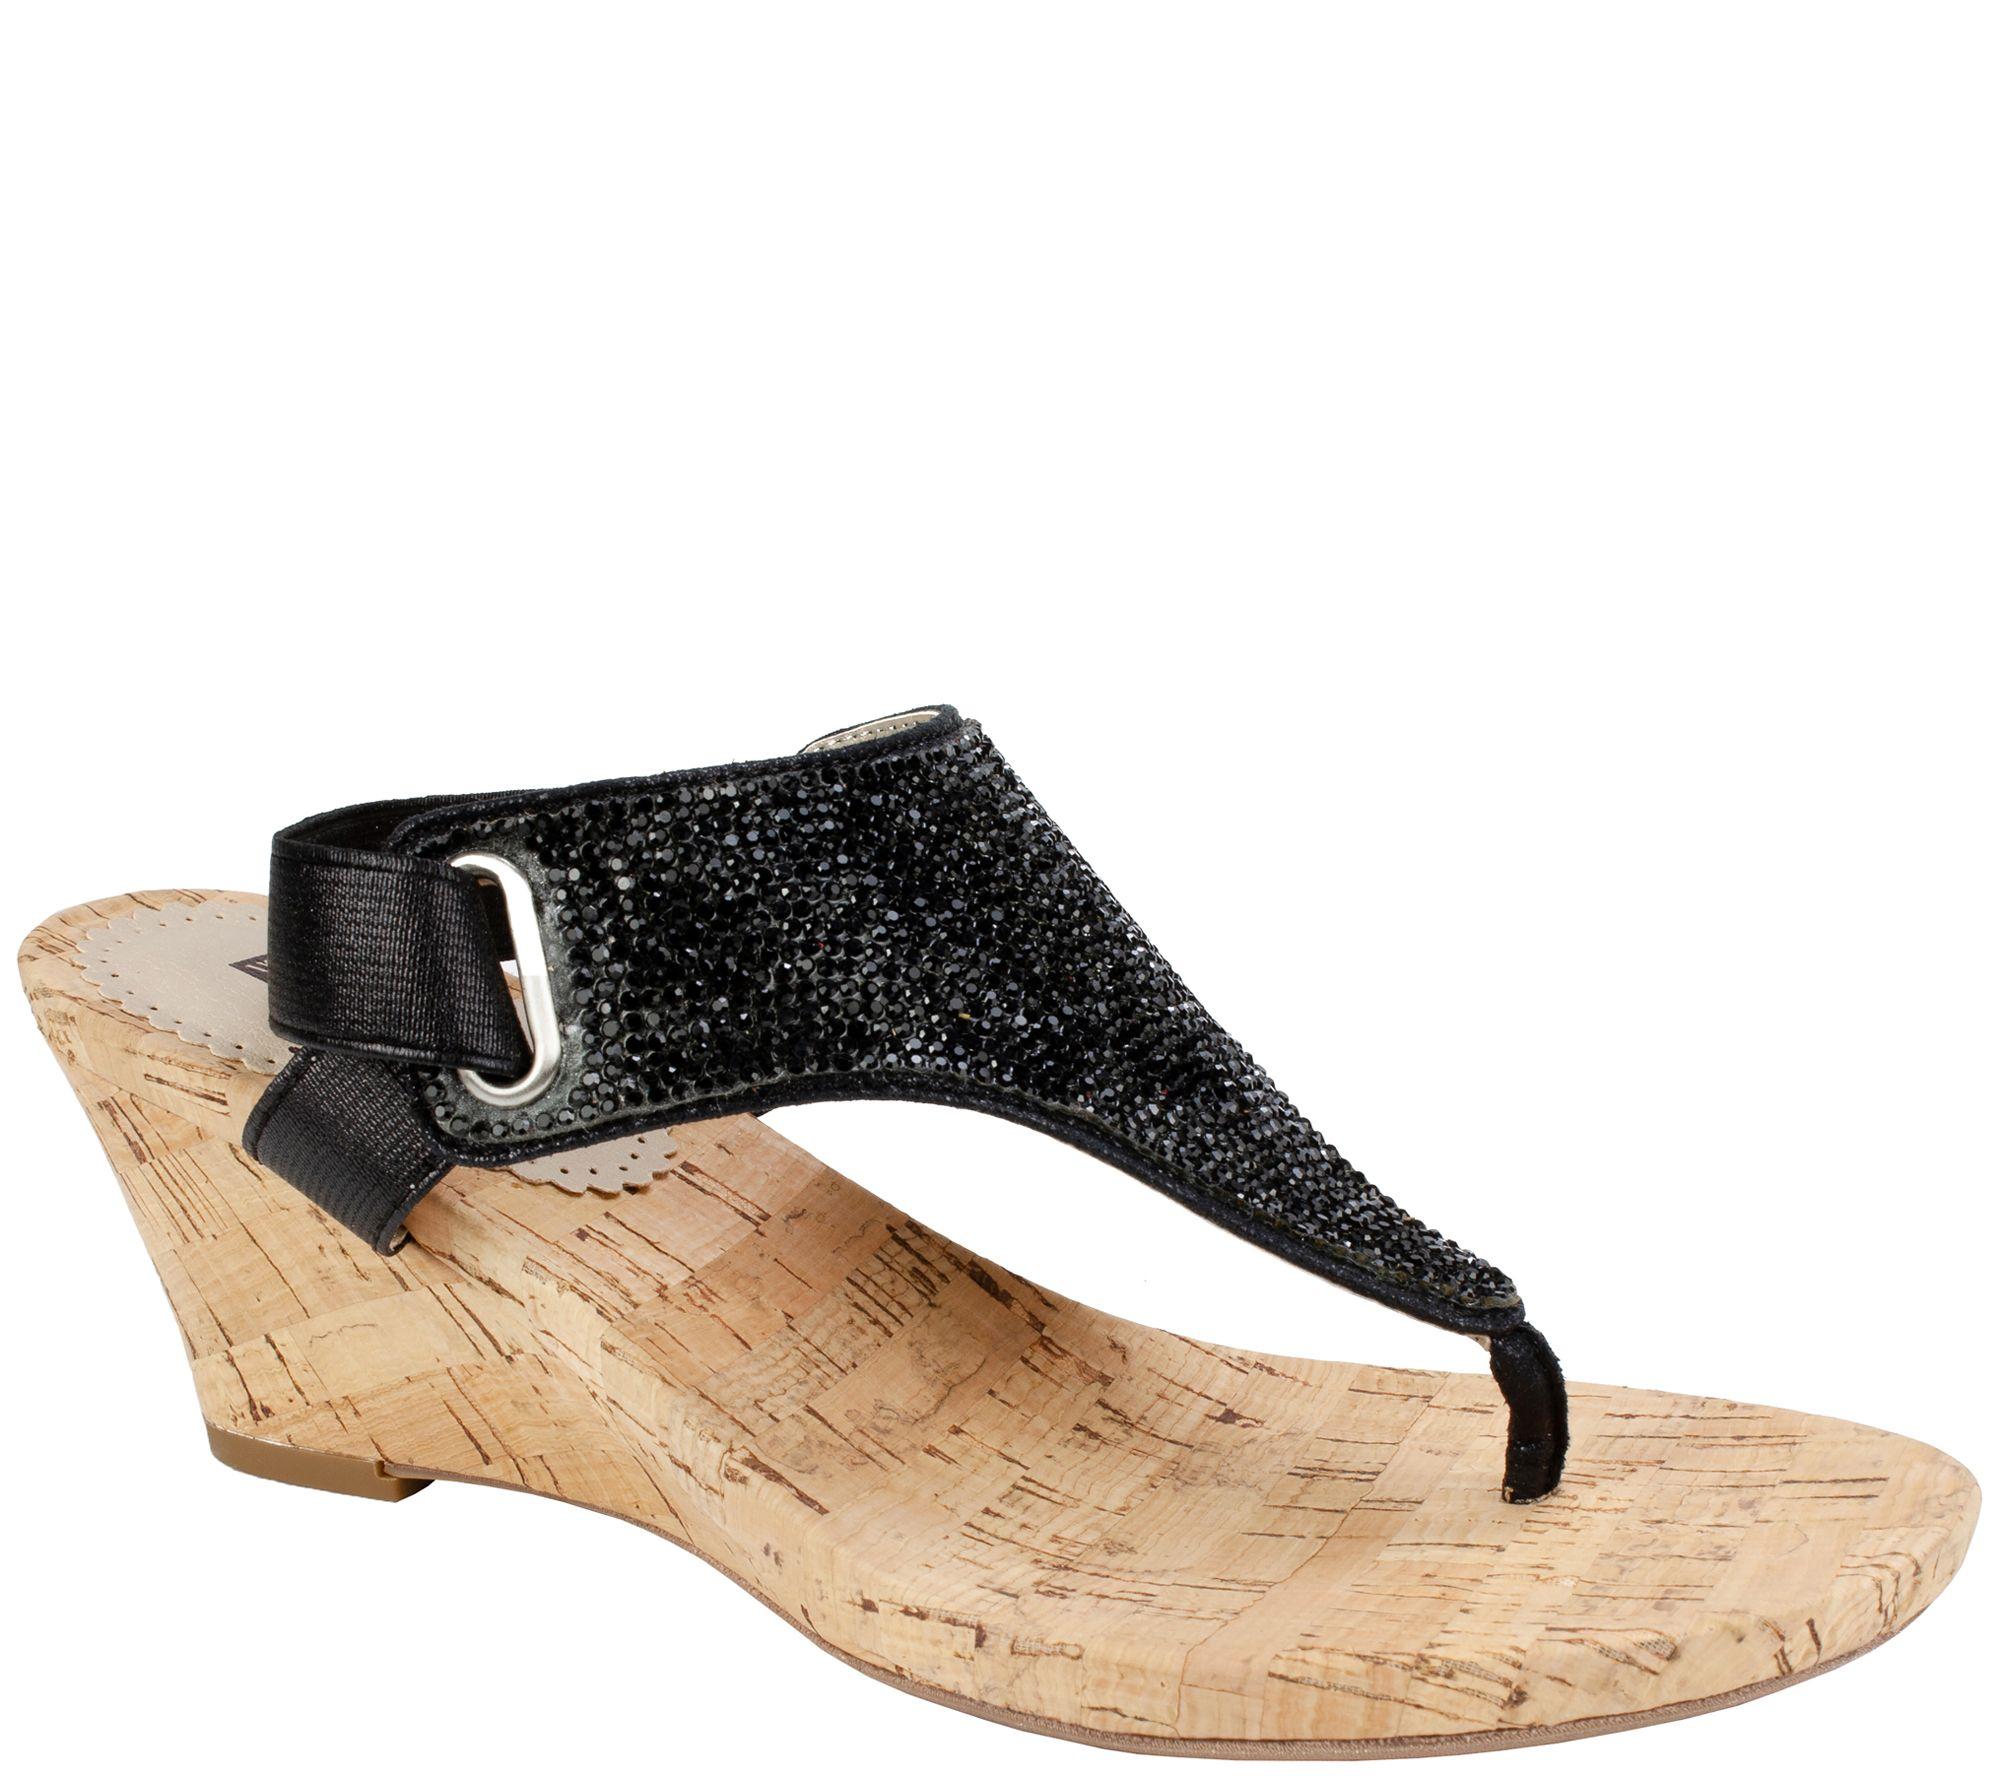 9b8b9ca146 White Mountain Cork Wedge Thong Sandals - Allegheny — QVC.com